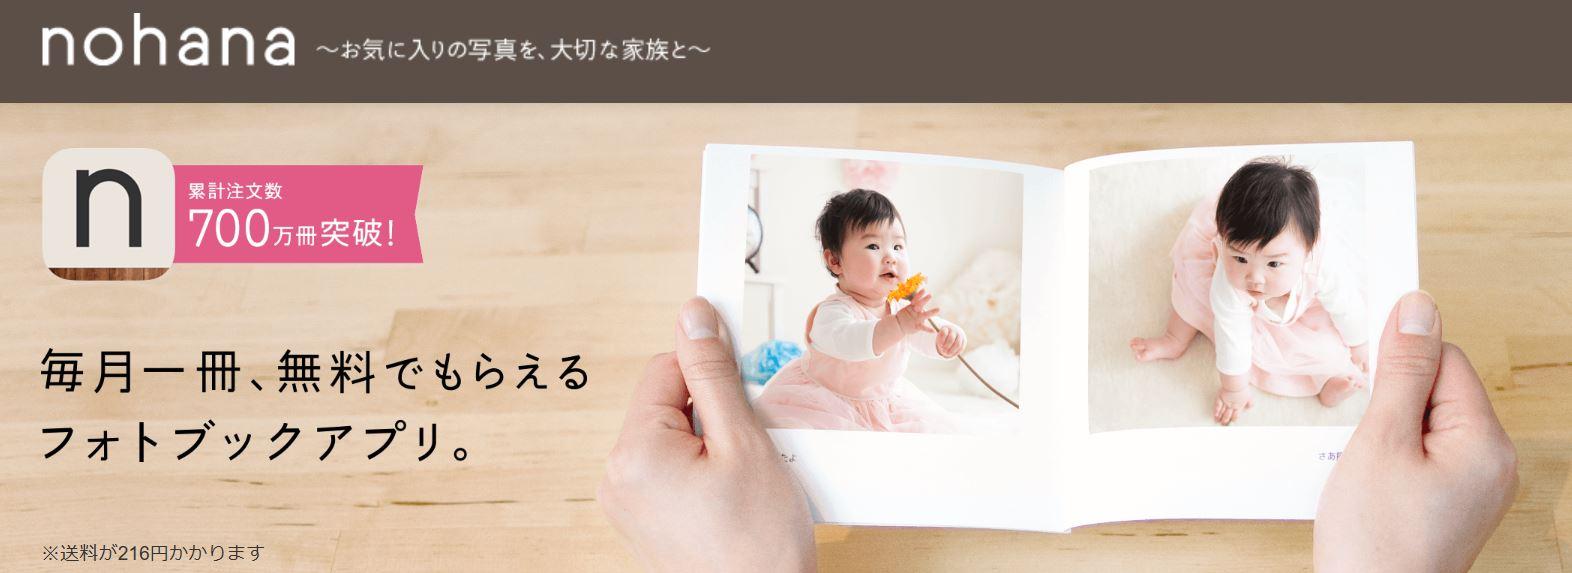 nohanaのフォトブック見本画像